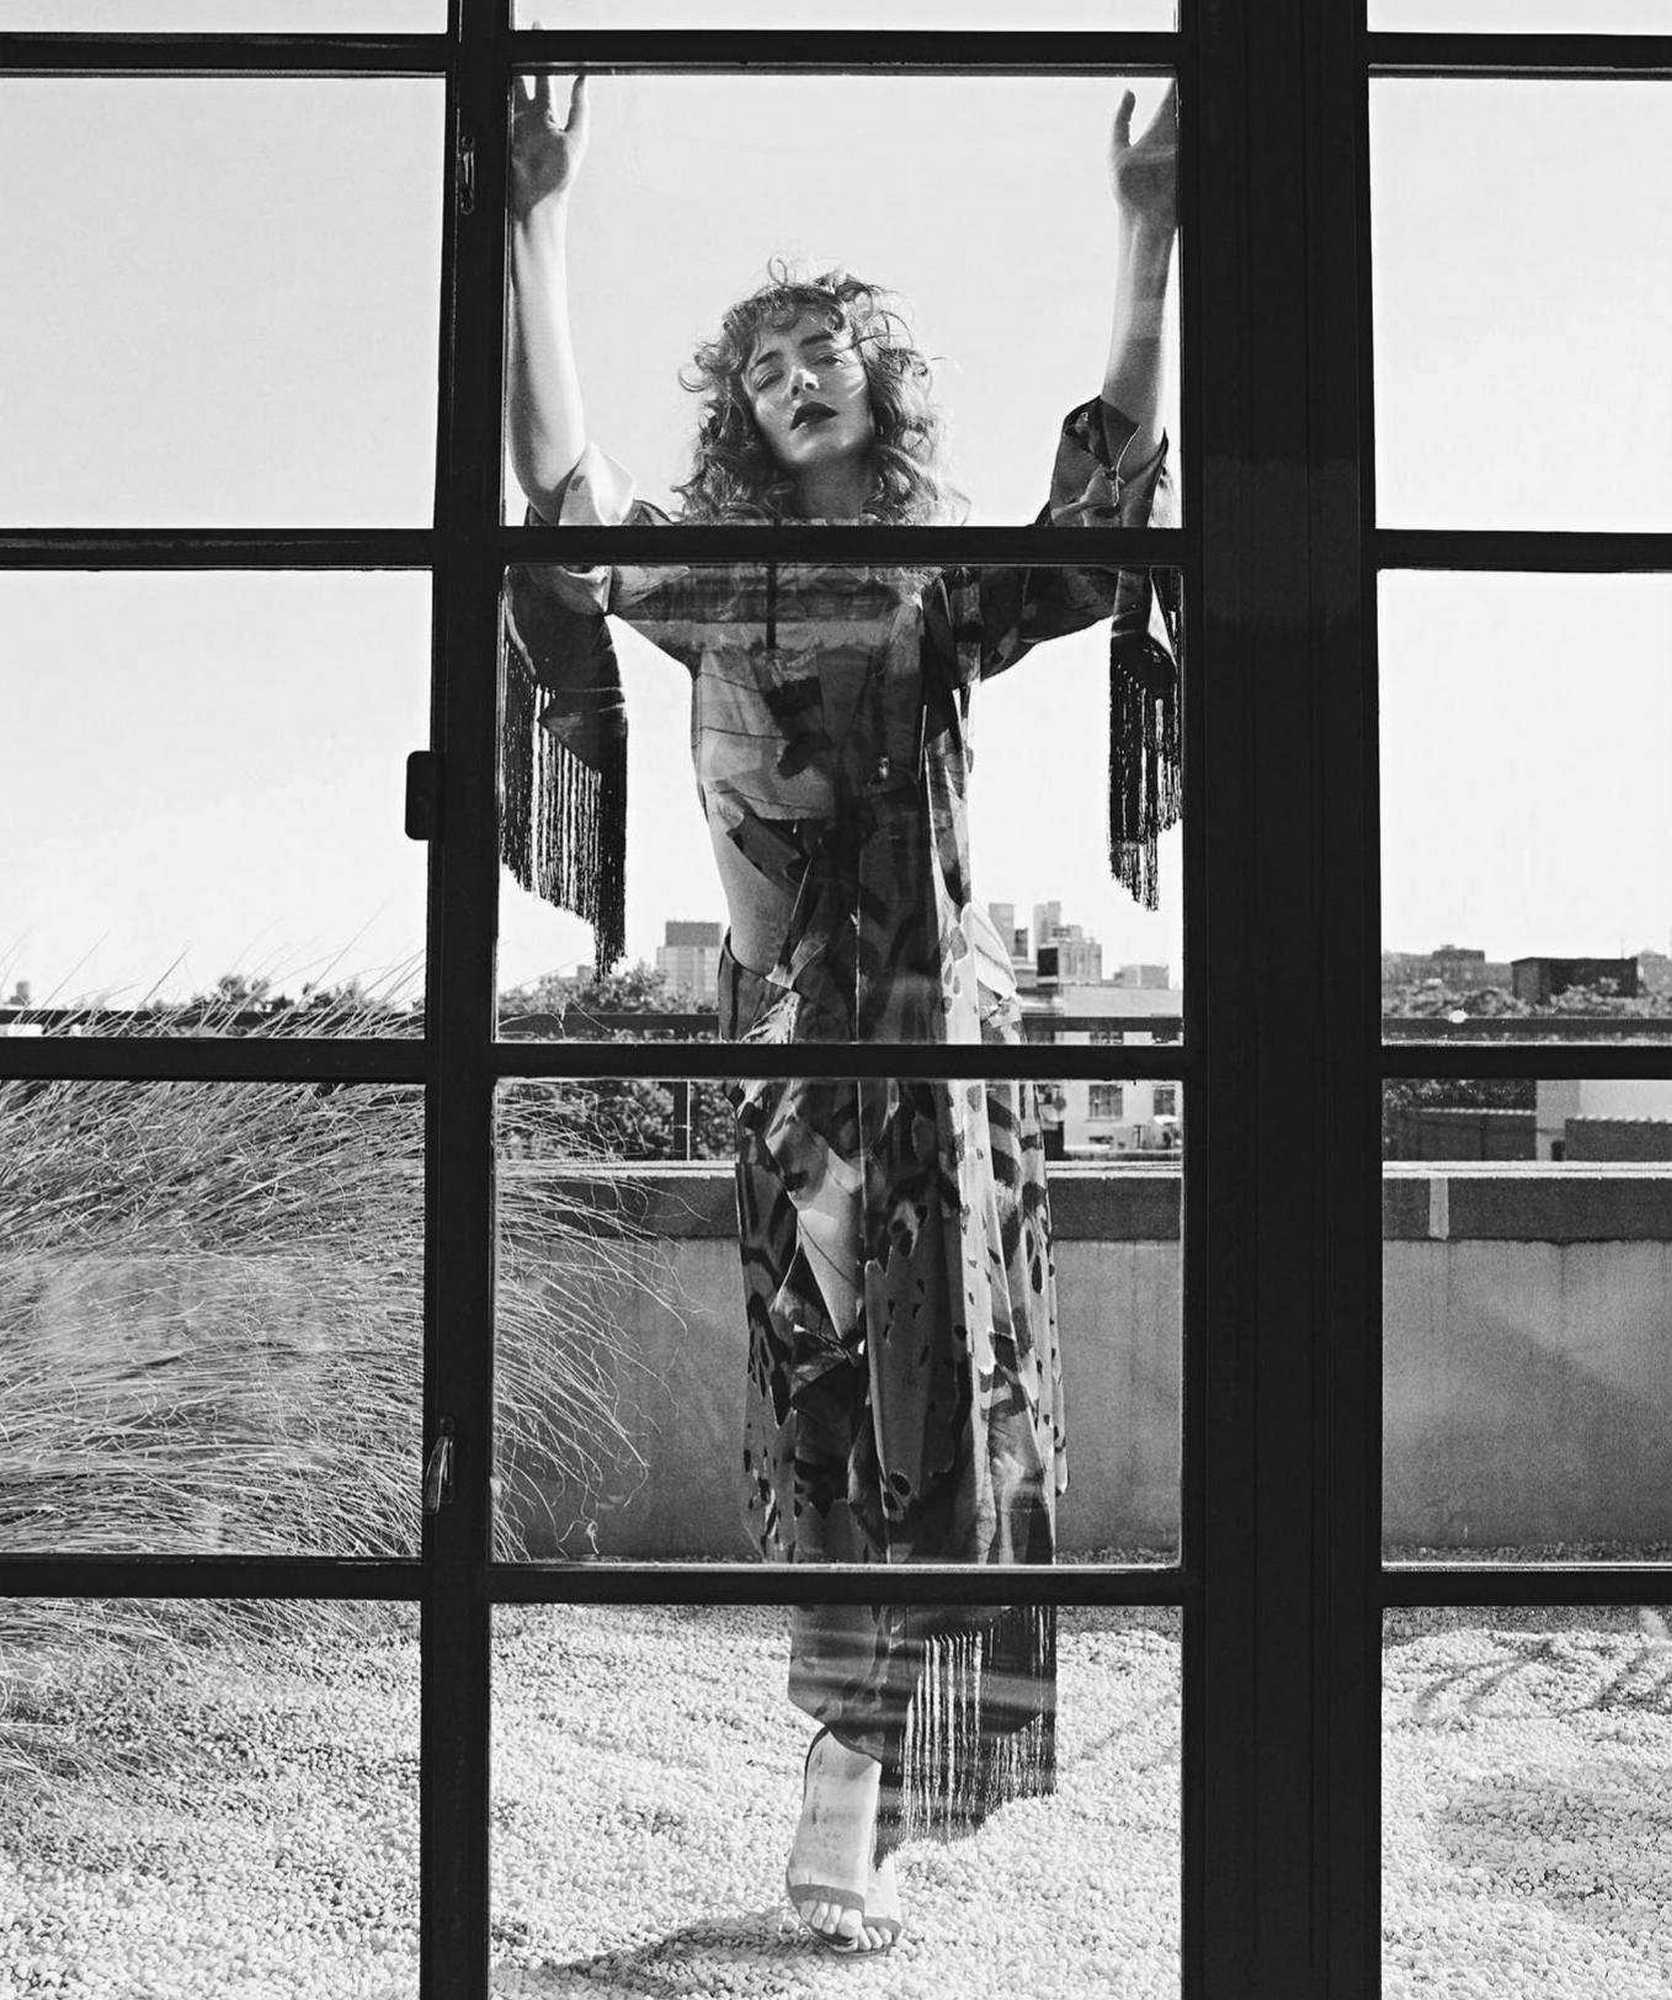 Dakota-Johnson-Emma-Summerton-Photoshoot-for-Vogue-Australia-October-2018093b60983482744.jpg